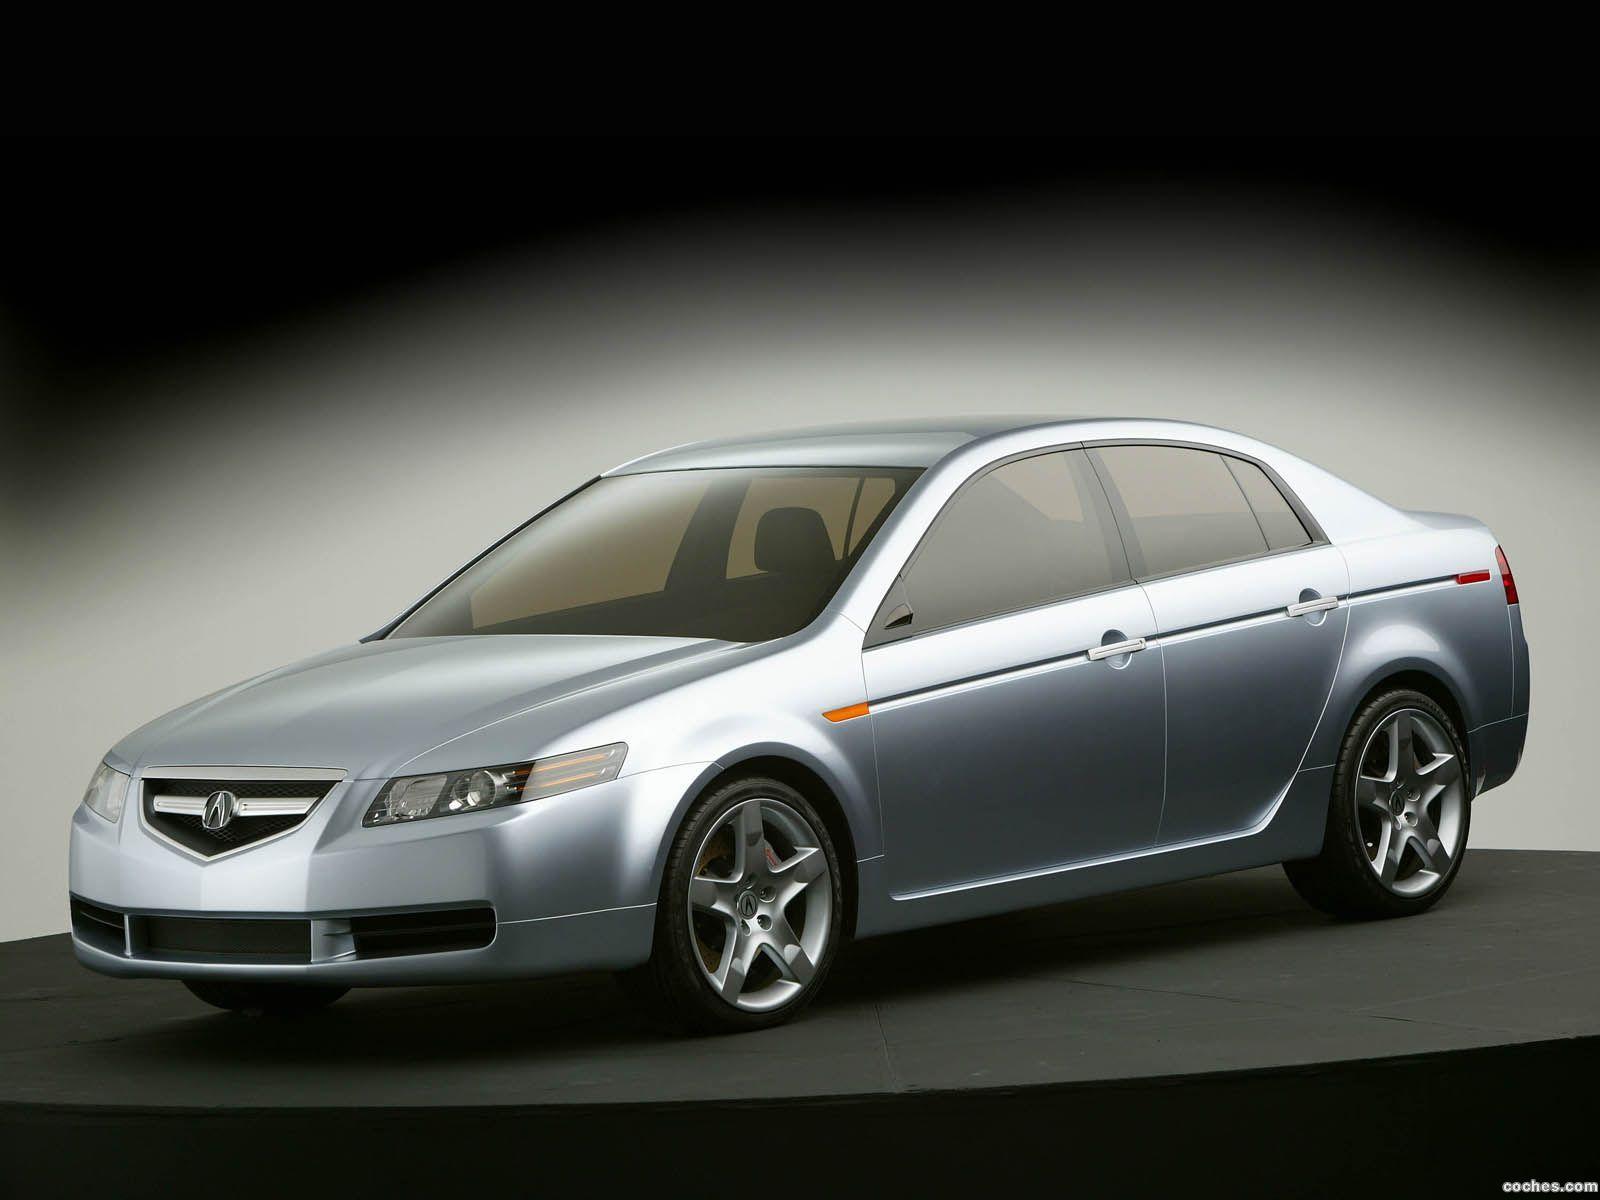 Foto 5 de Acura TL Concept 2003